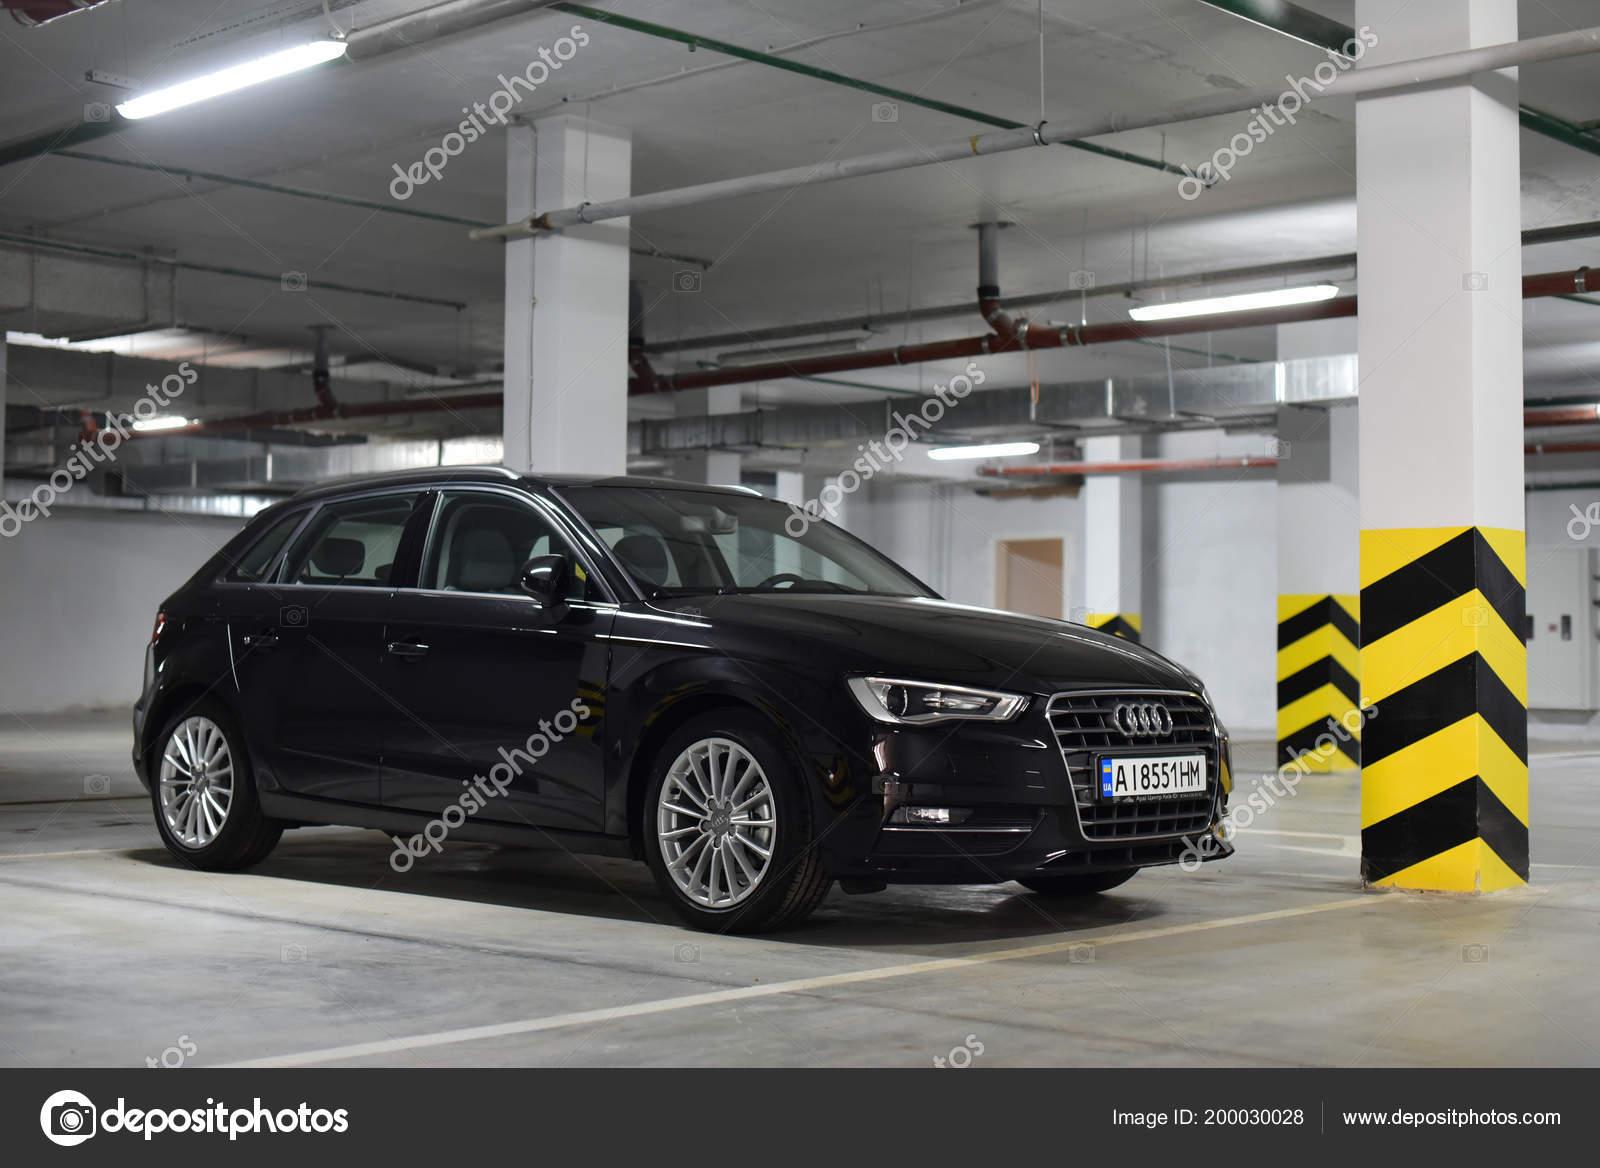 Kiev Ukraine Car Audi Hatchback Parked Underground Parking Apartments Stock Editorial Photo C Alexfan32 200030028